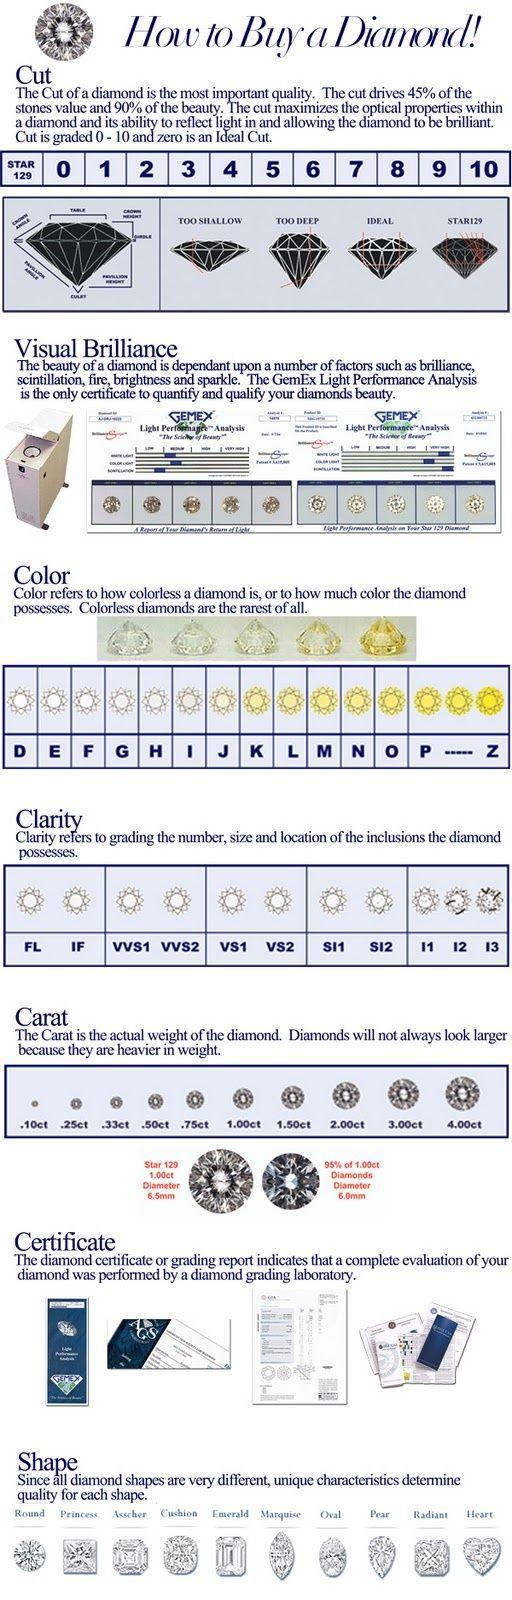 How to buy a diamond... http://www.arthursjewelers.com